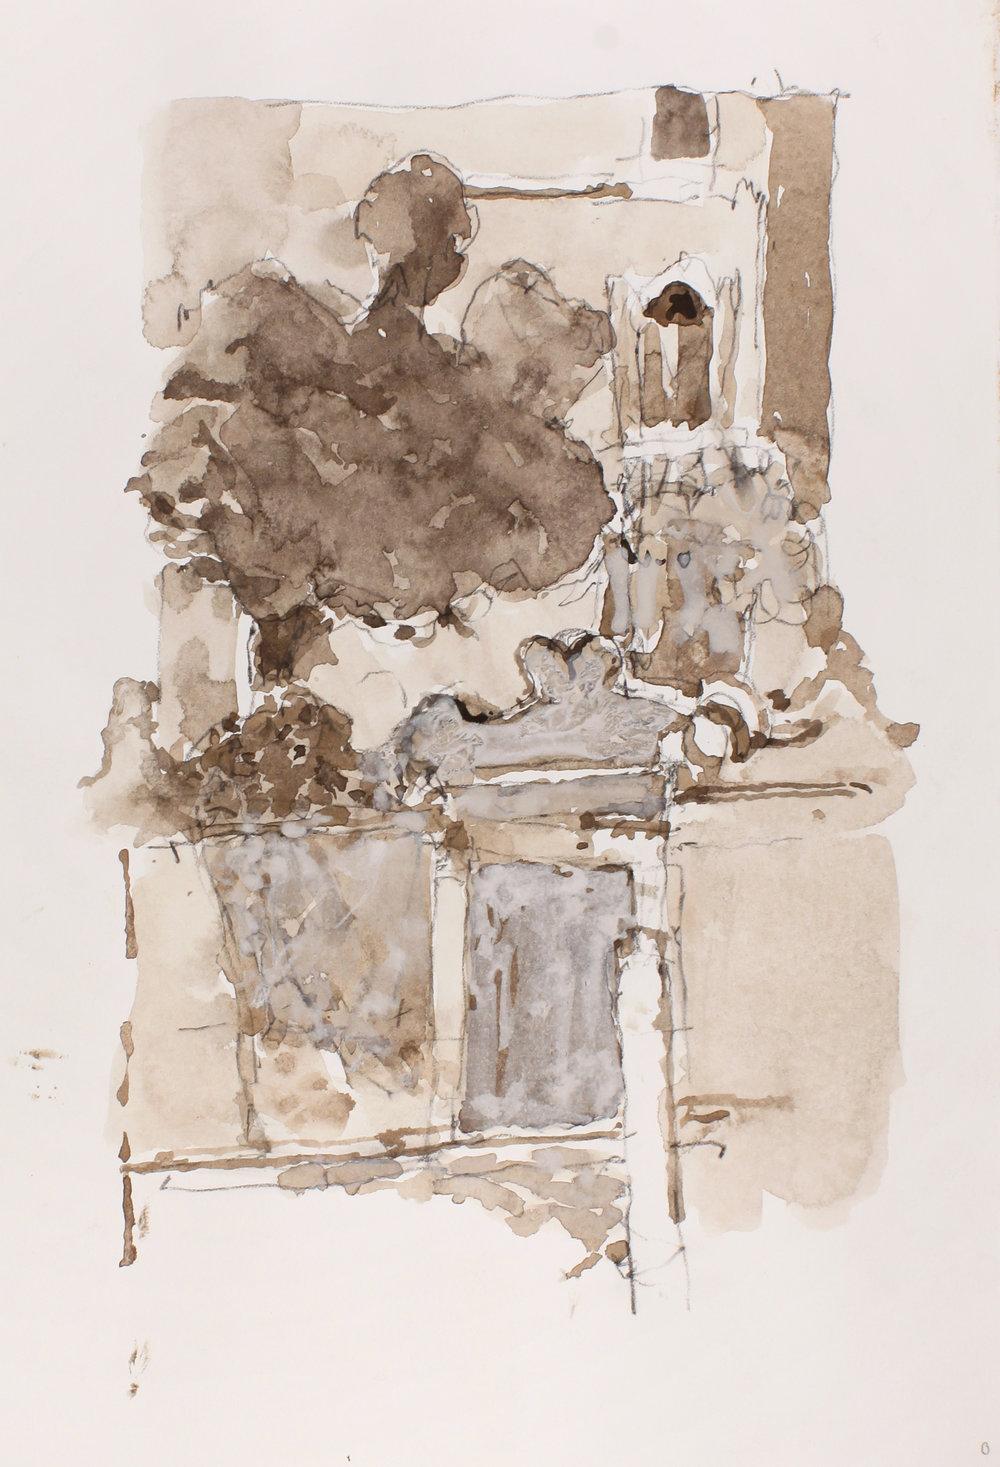 2002_Houses_at_Santa_Ternita_Venice_watercolour_on_paper_15x11in_WPF258.jpg